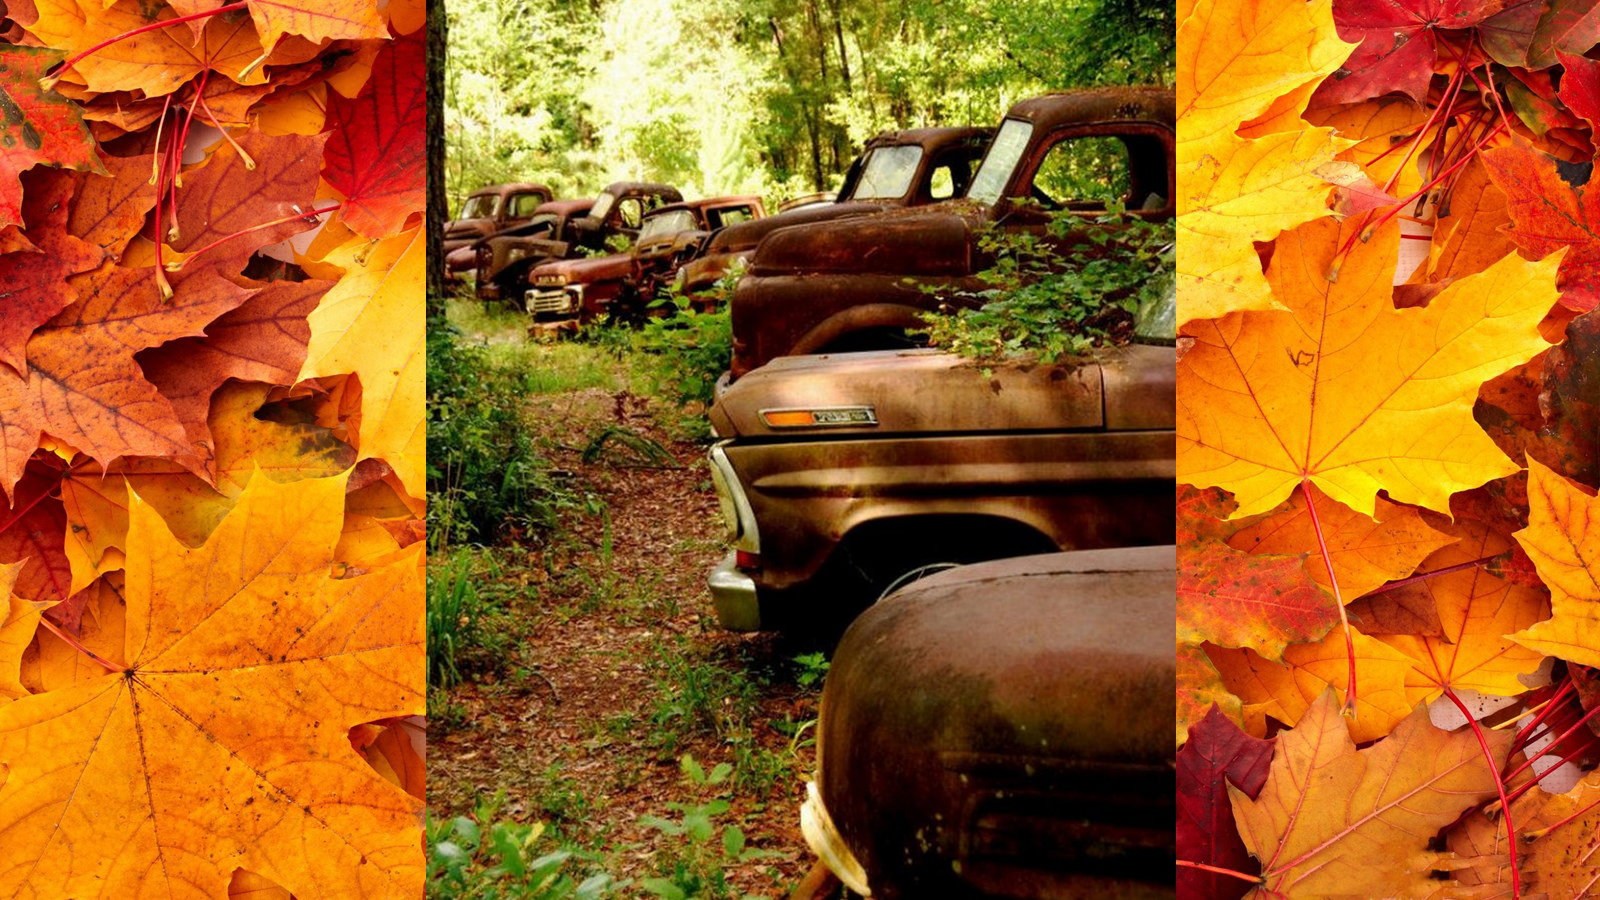 10 Ford Trucks Basking in Fall Leaves